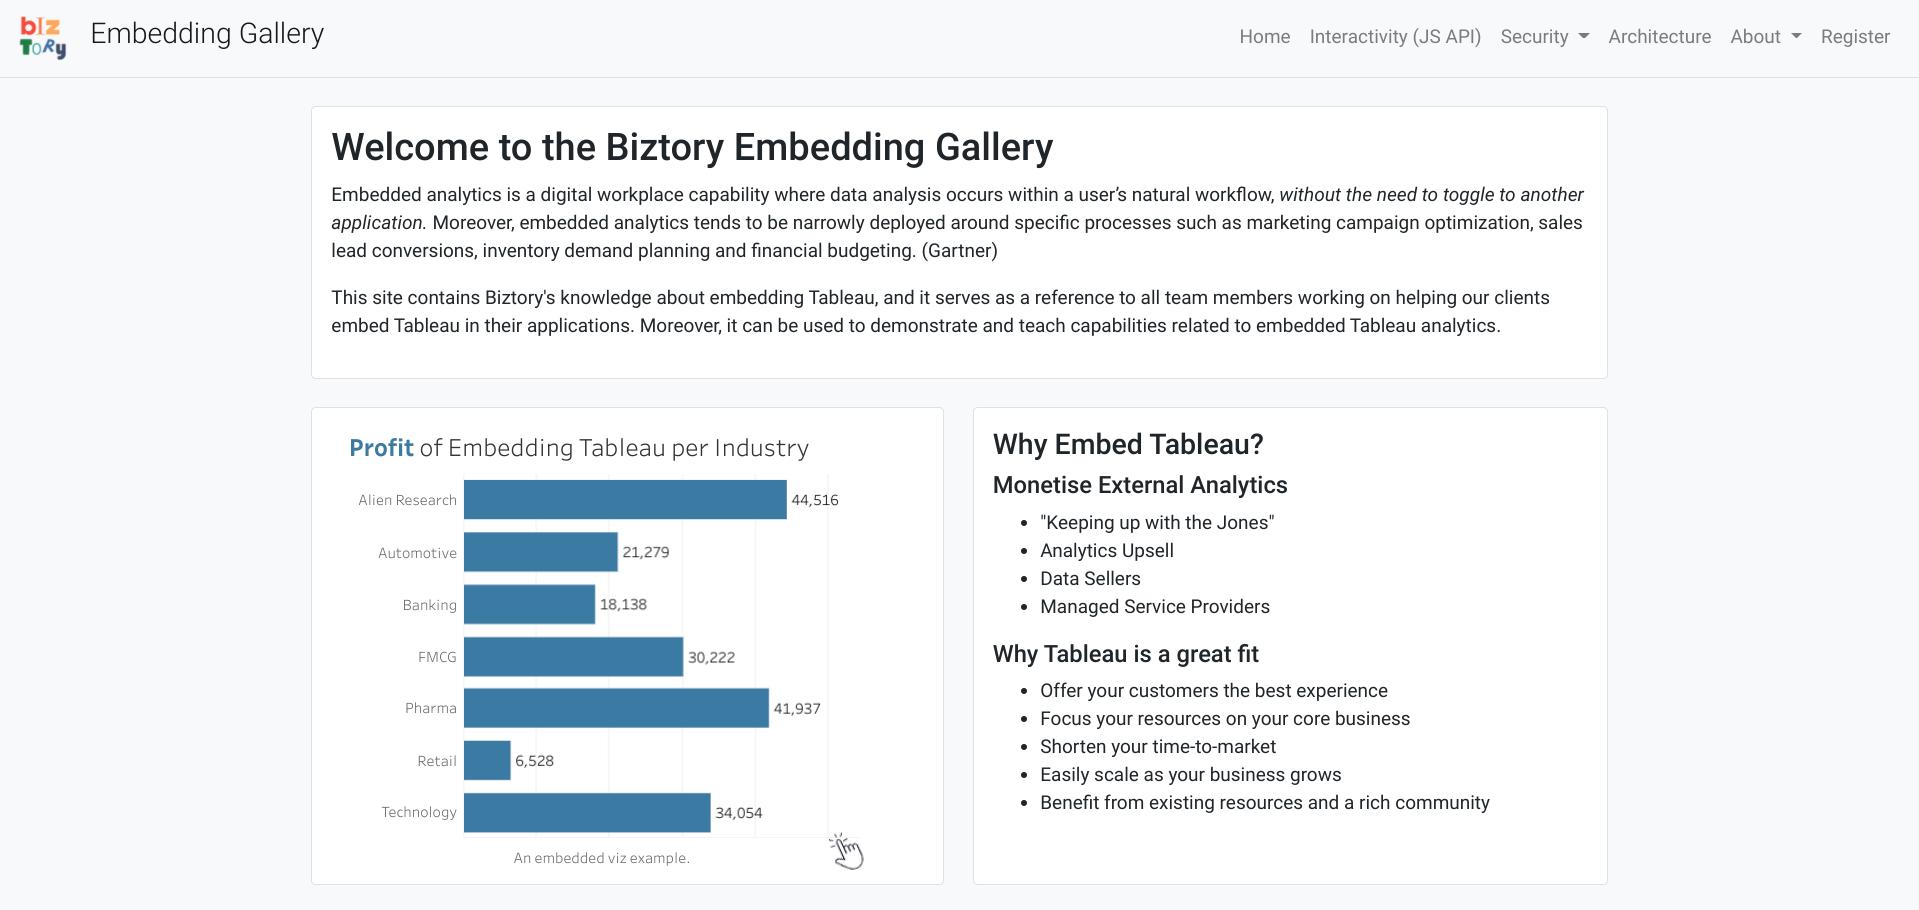 Biztory Embedded Gallery